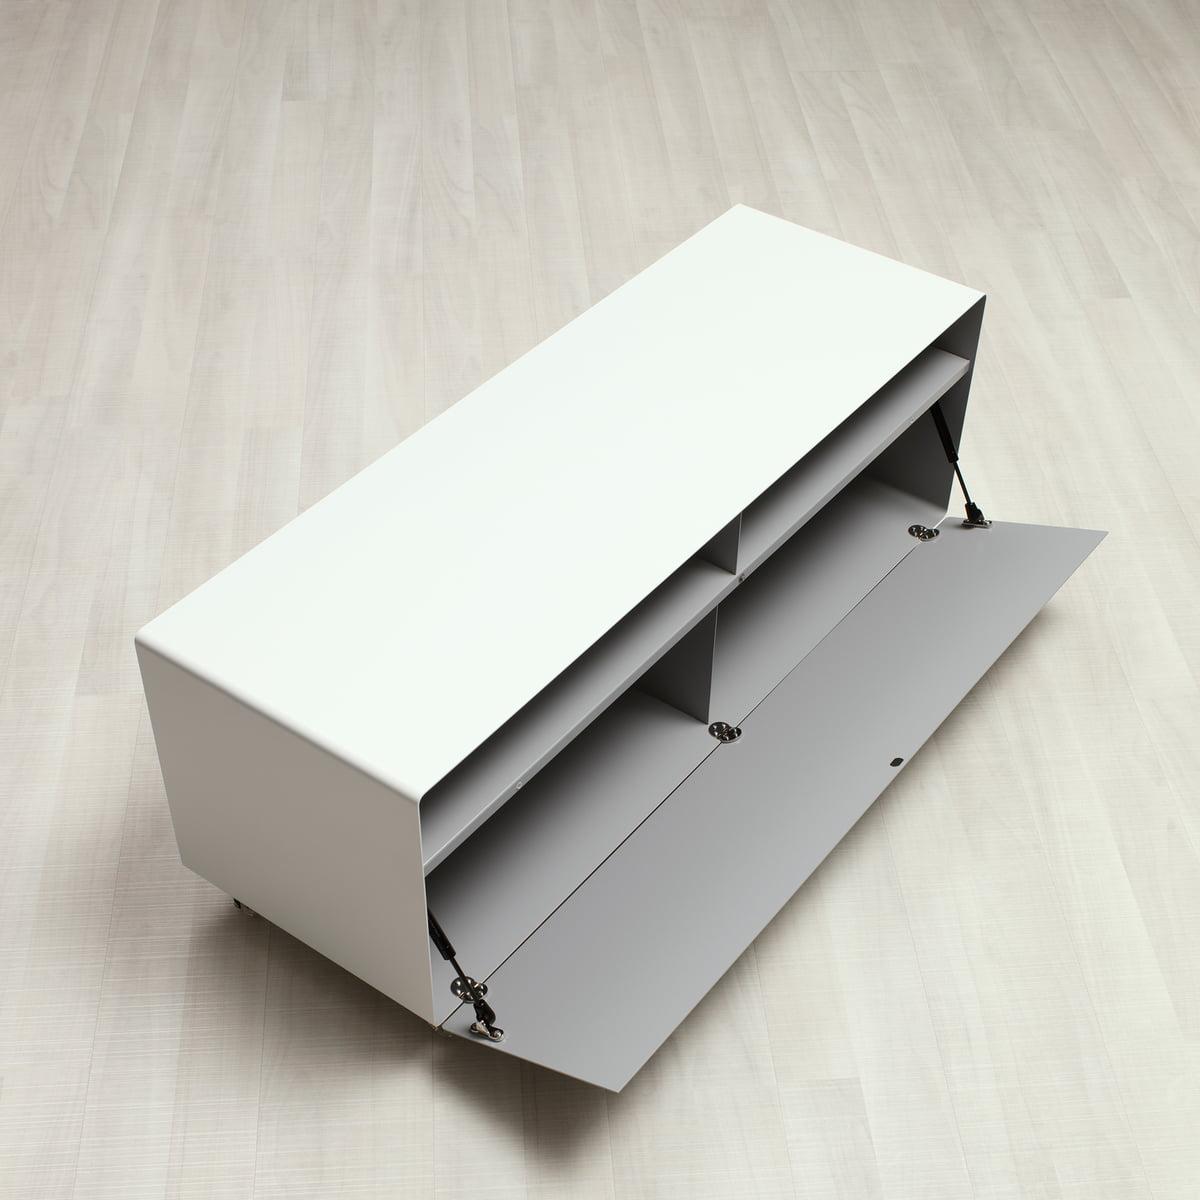 rw 109 sideboard by m ller m belfabrikation. Black Bedroom Furniture Sets. Home Design Ideas